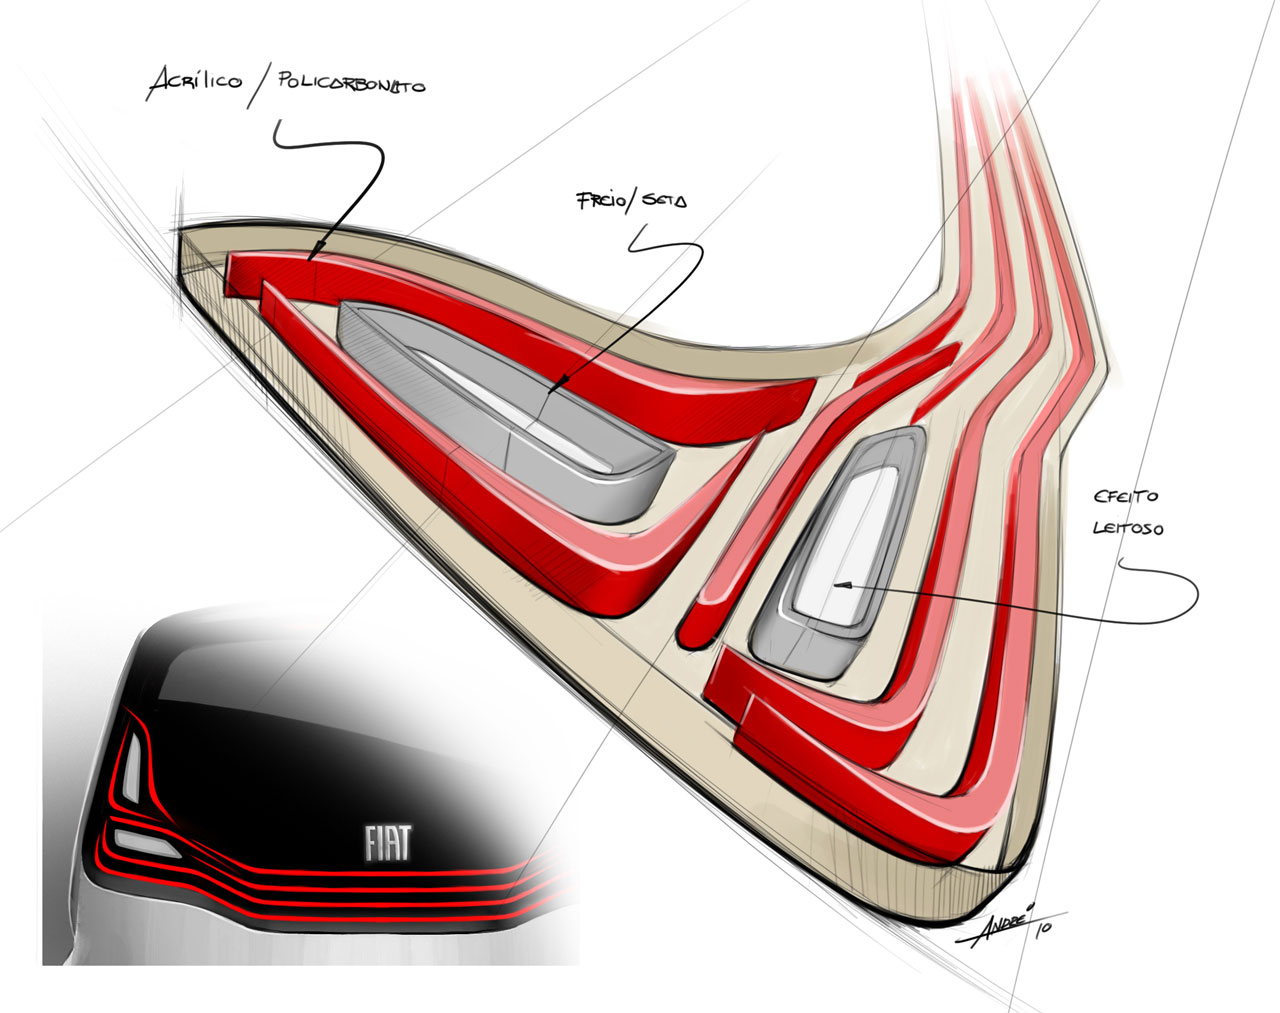 Fiat Mio FCC III Concept Tail Light Design Sketch - Car